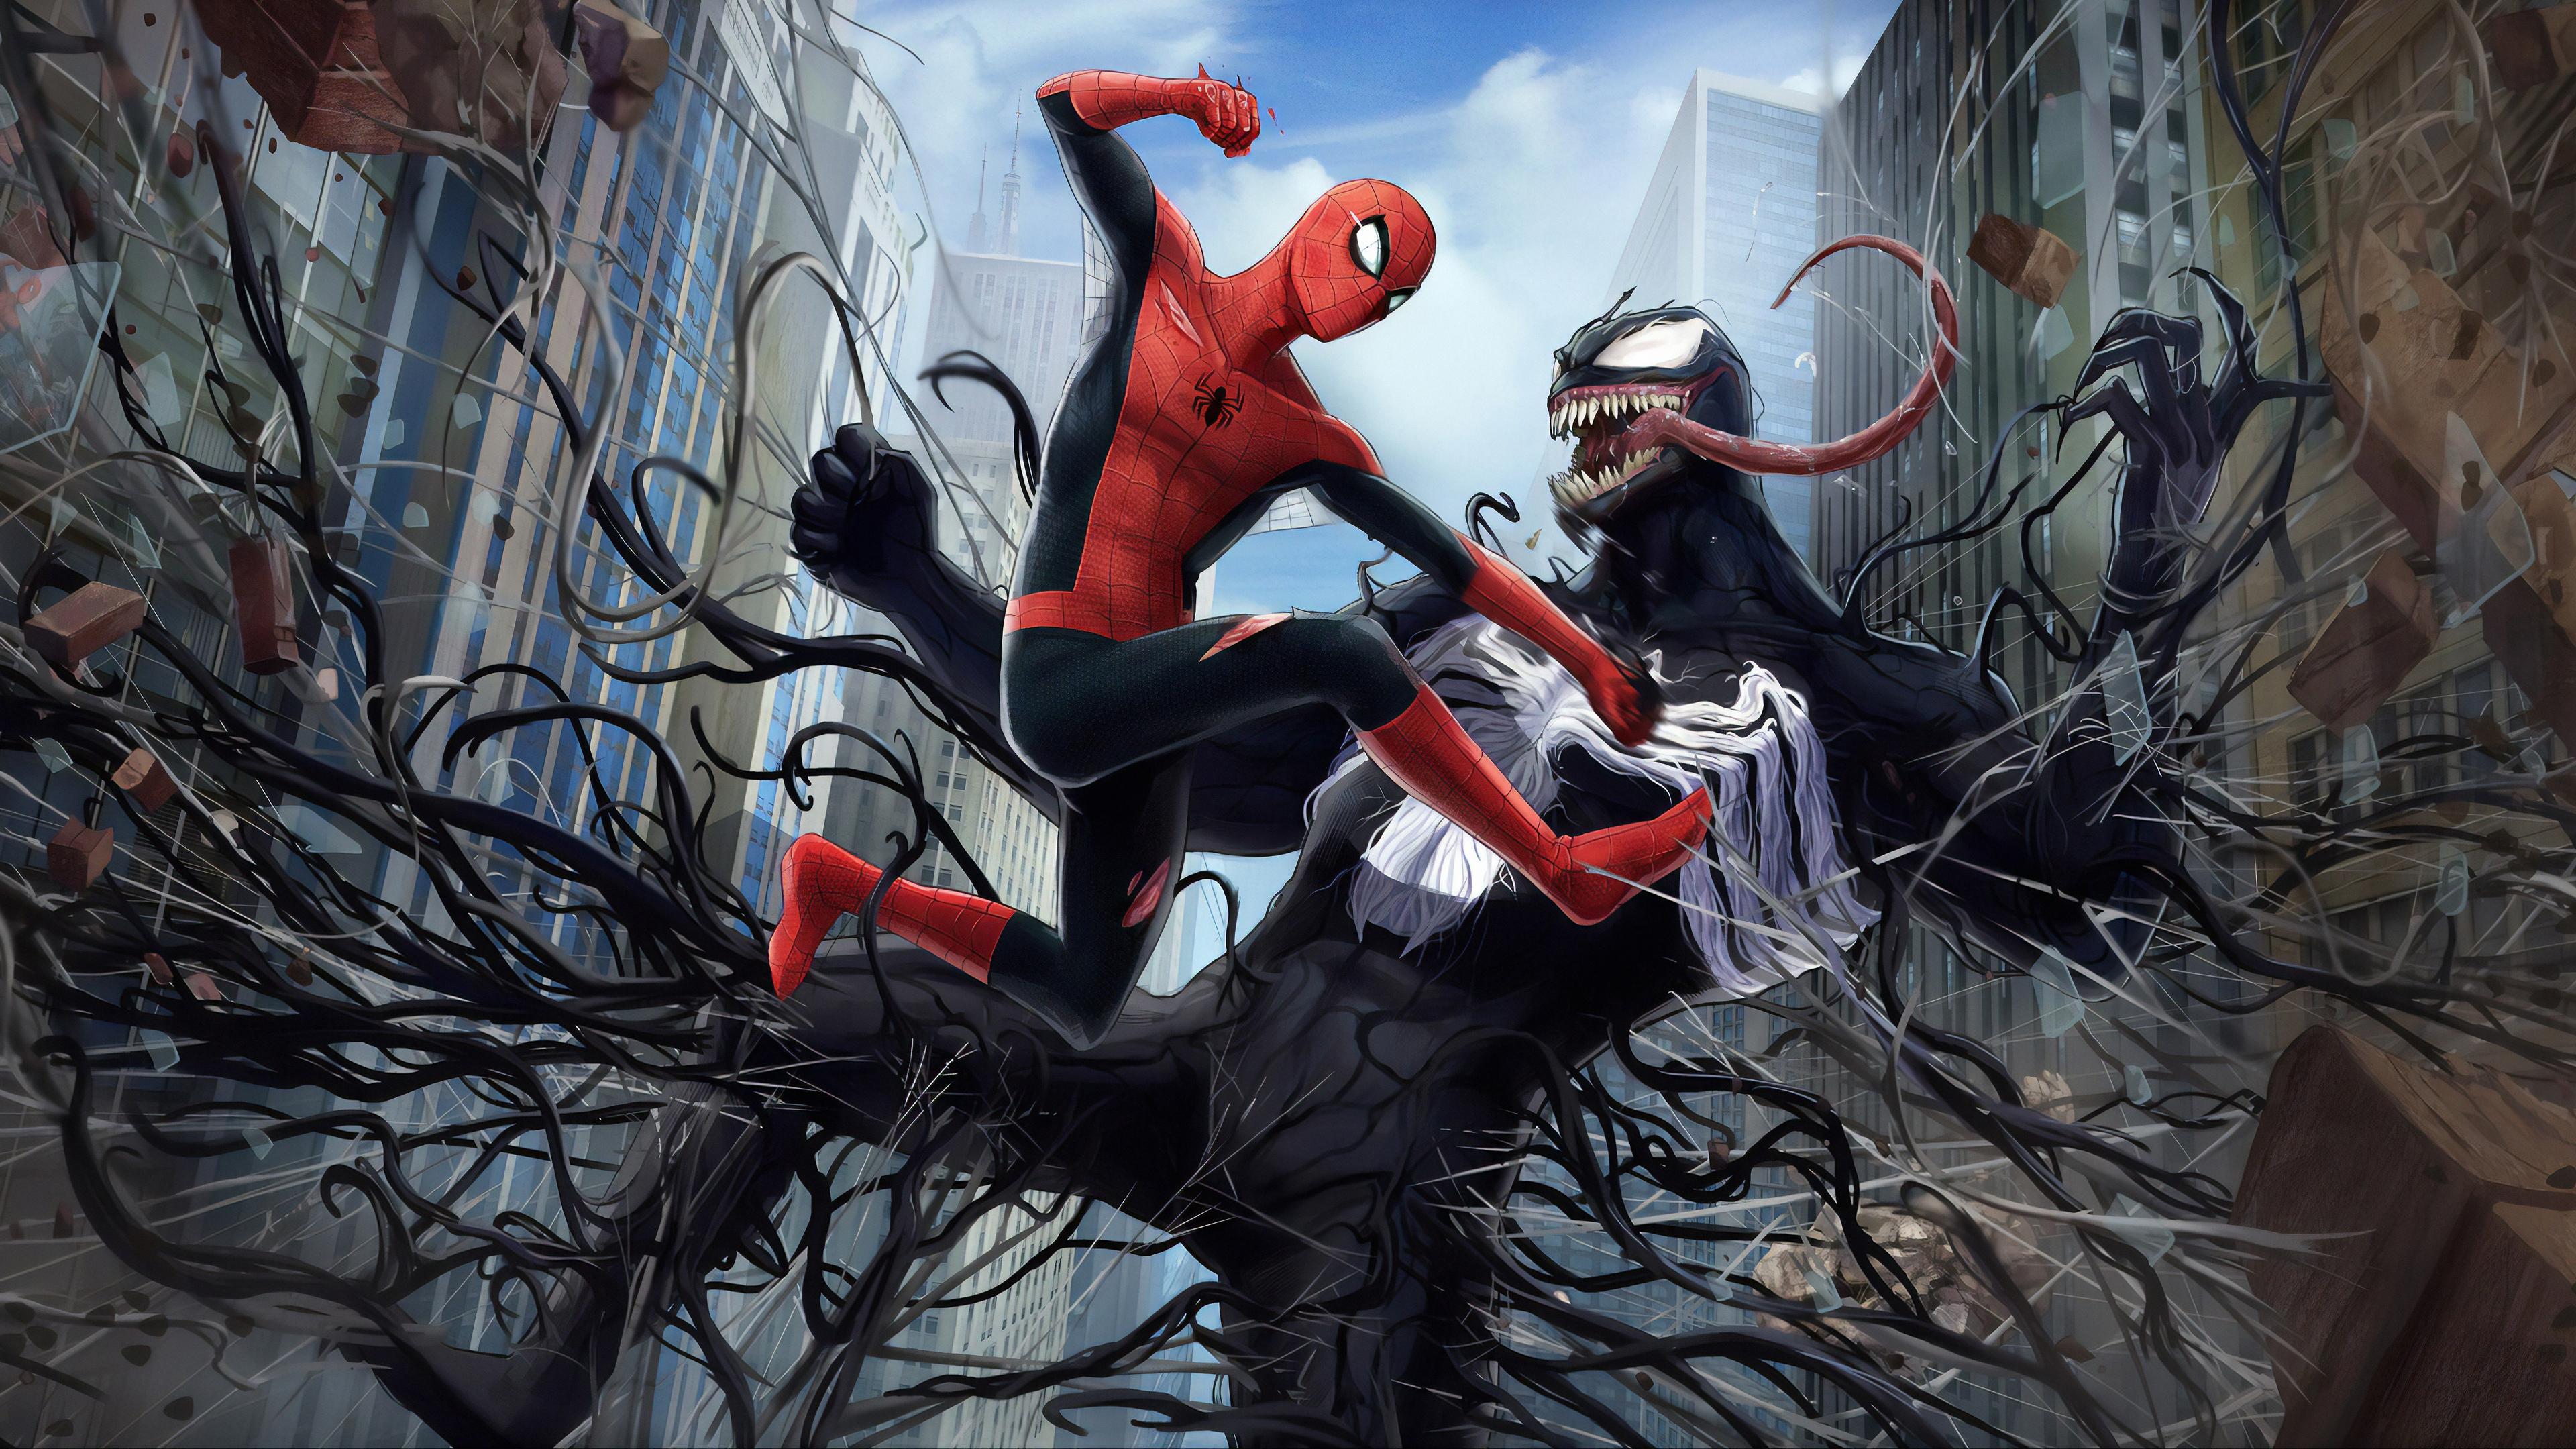 venom spiderman fight 1570394420 - Venom Spiderman Fight - Venom wallpapers, superheroes wallpapers, spiderman wallpapers, hd-wallpapers, artwork wallpapers, 4k-wallpapers